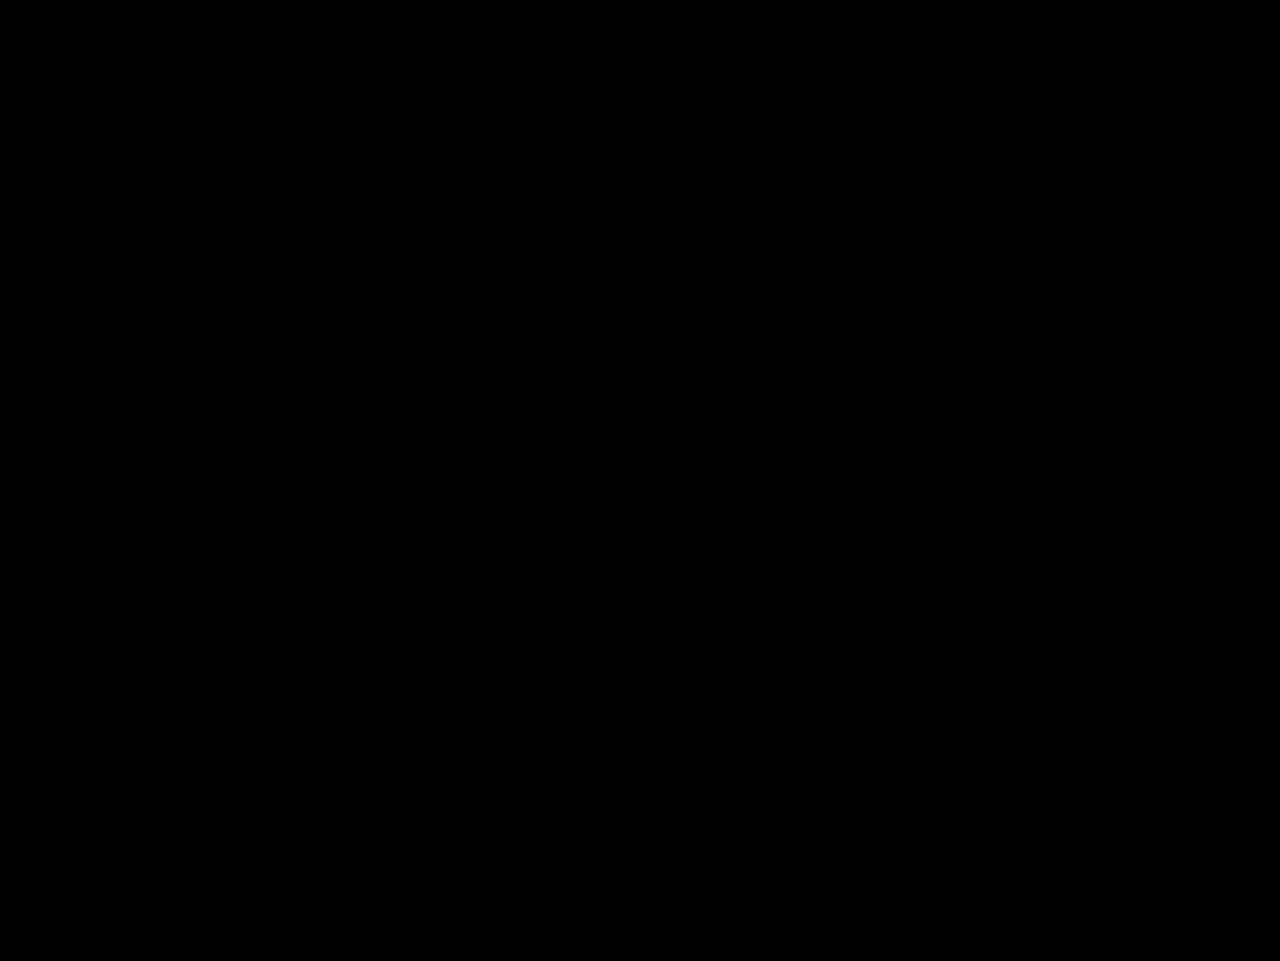 Signe du zodiaque chinois du buffle